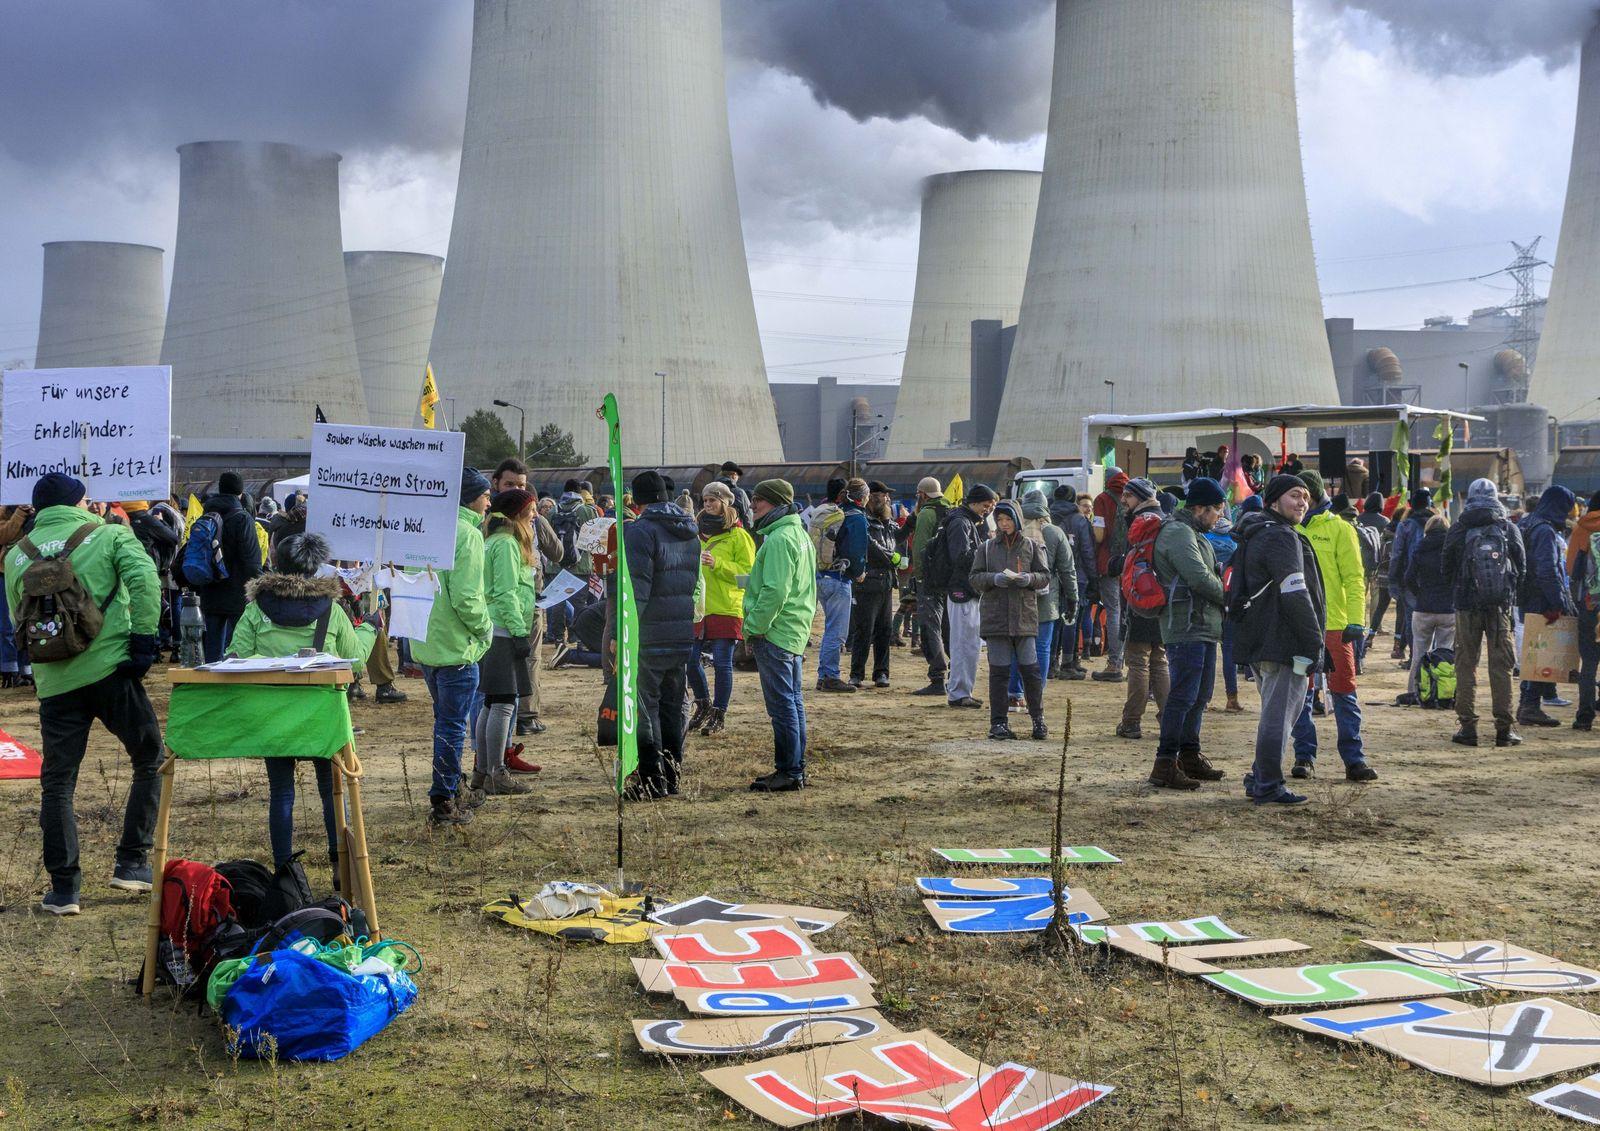 Anti-Kohle-Proteste am Kraftwerk Jänschwalde DEU/Brandenburg /Jänschwalde Anti-Kohle-Proteste am Kraftwerk Jänschwalde